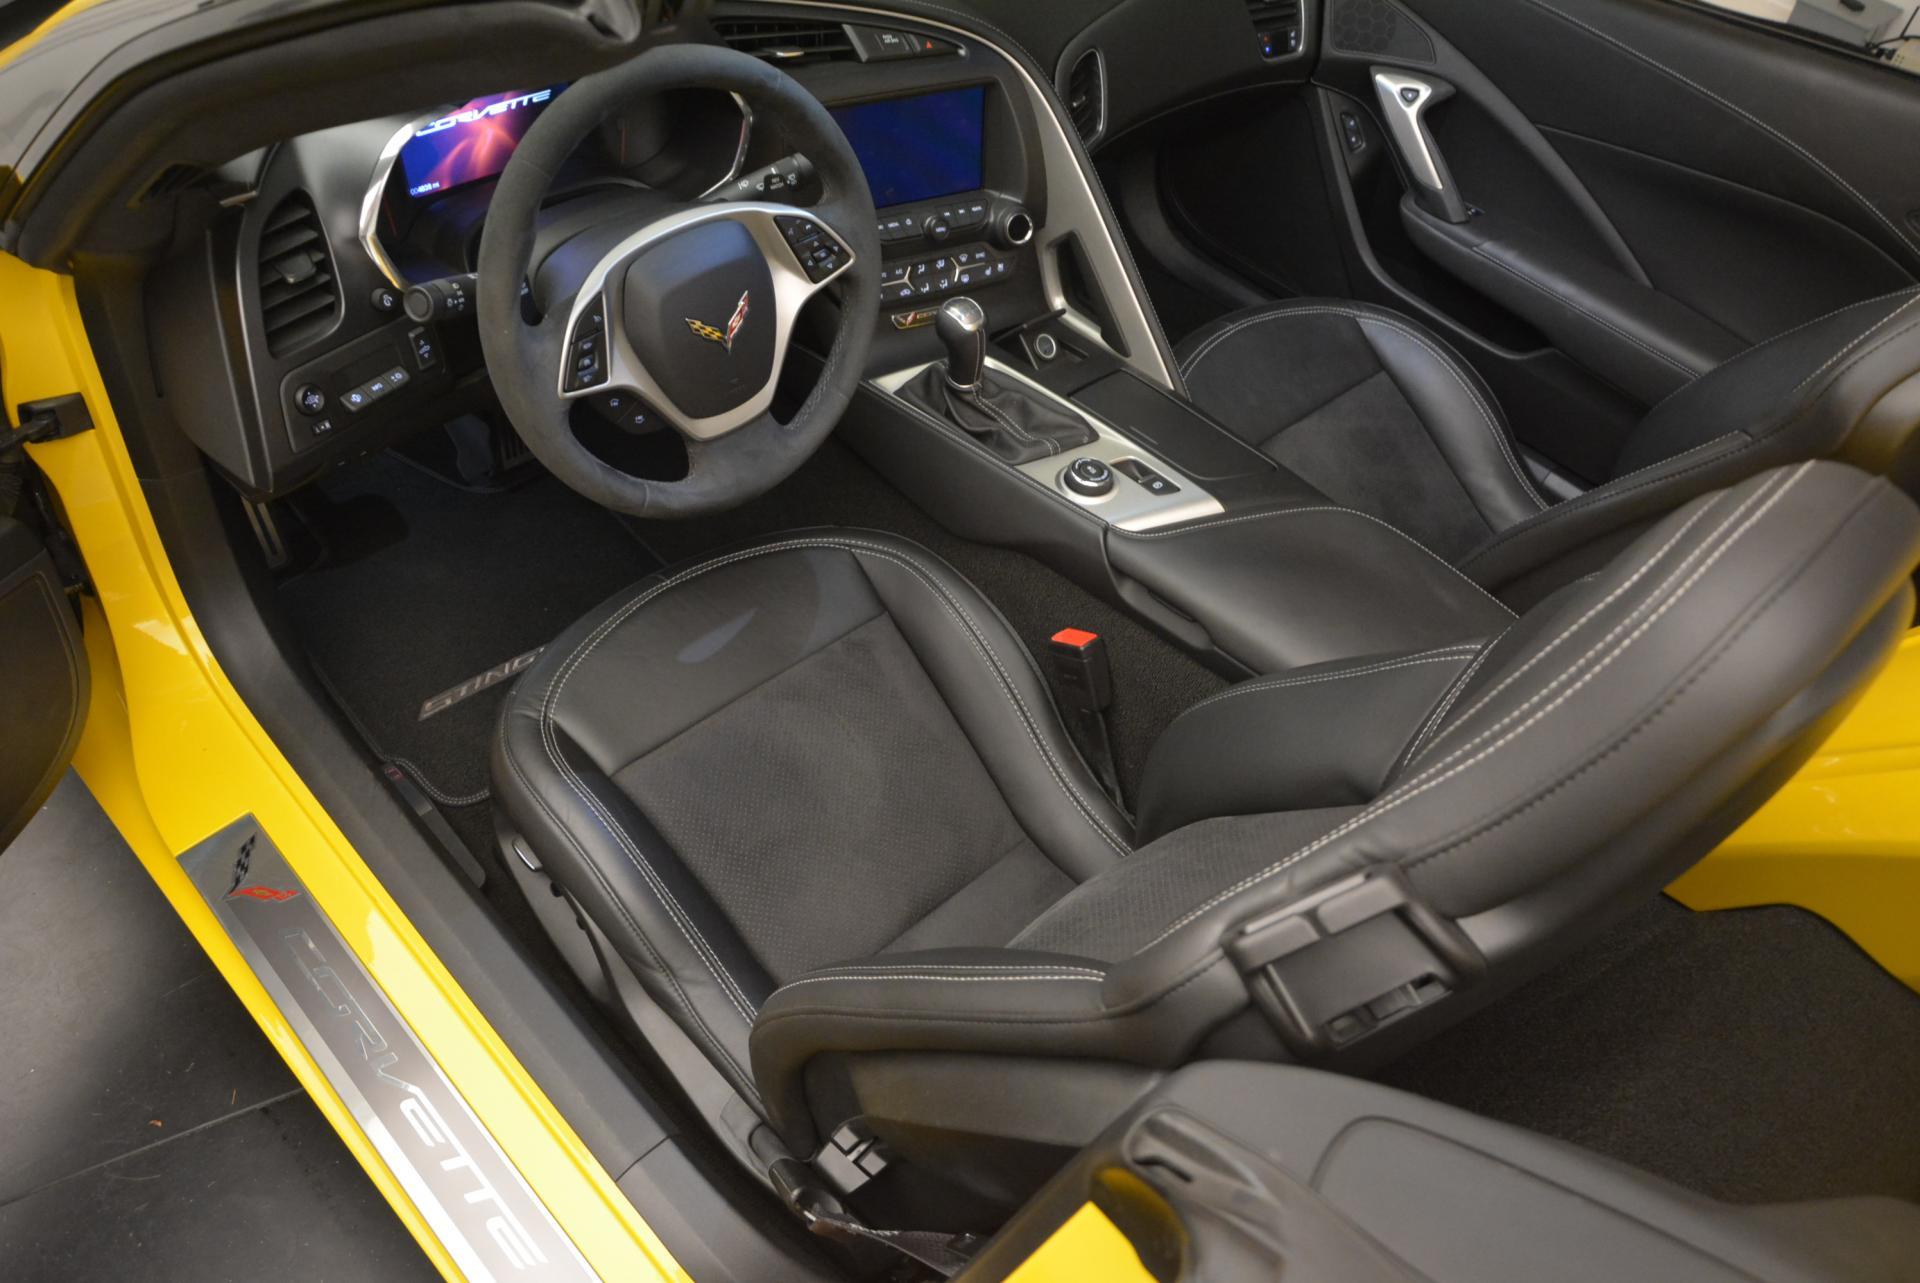 Used 2014 Chevrolet Corvette Stingray Z51 For Sale In Greenwich, CT 523_p13